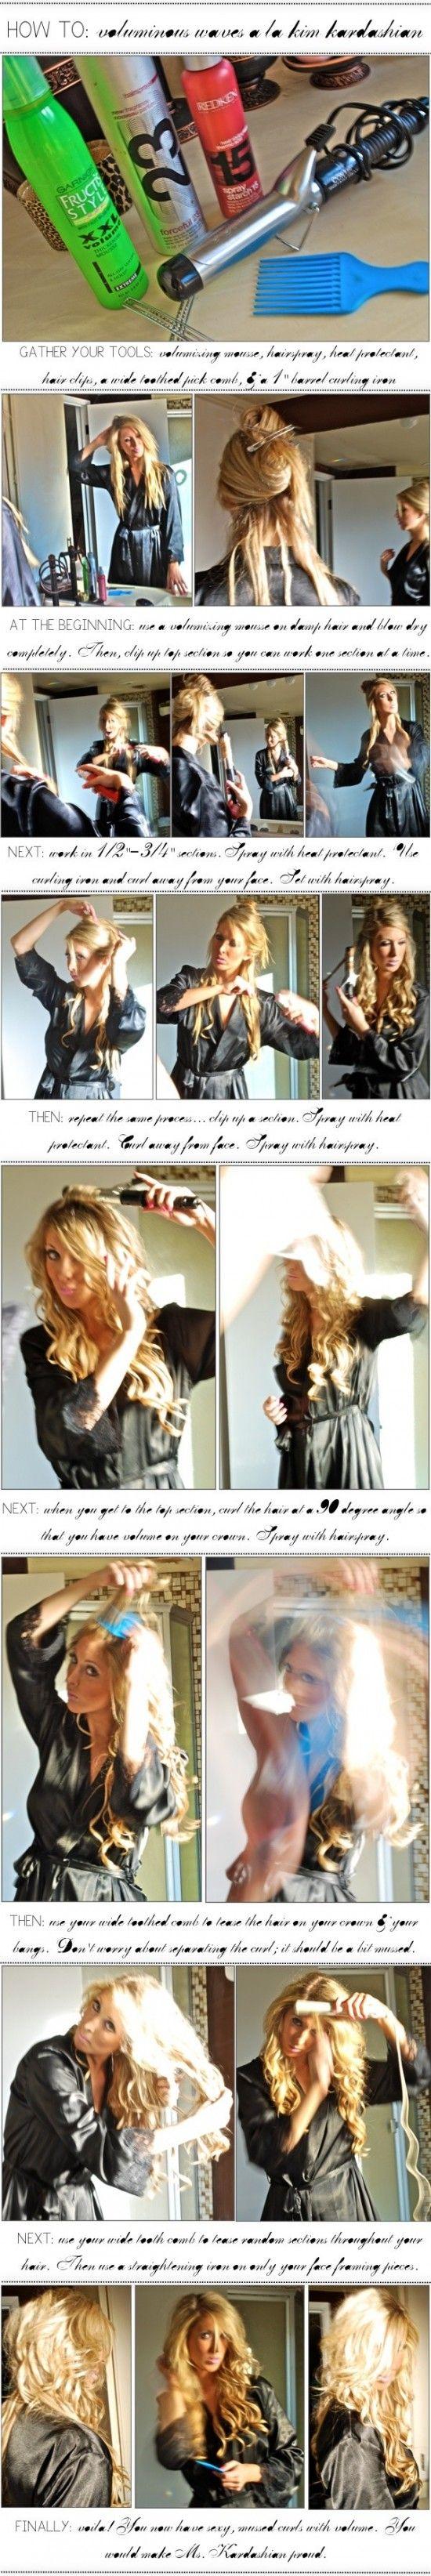 best ideas about hair on pinterest her hair long layered hair